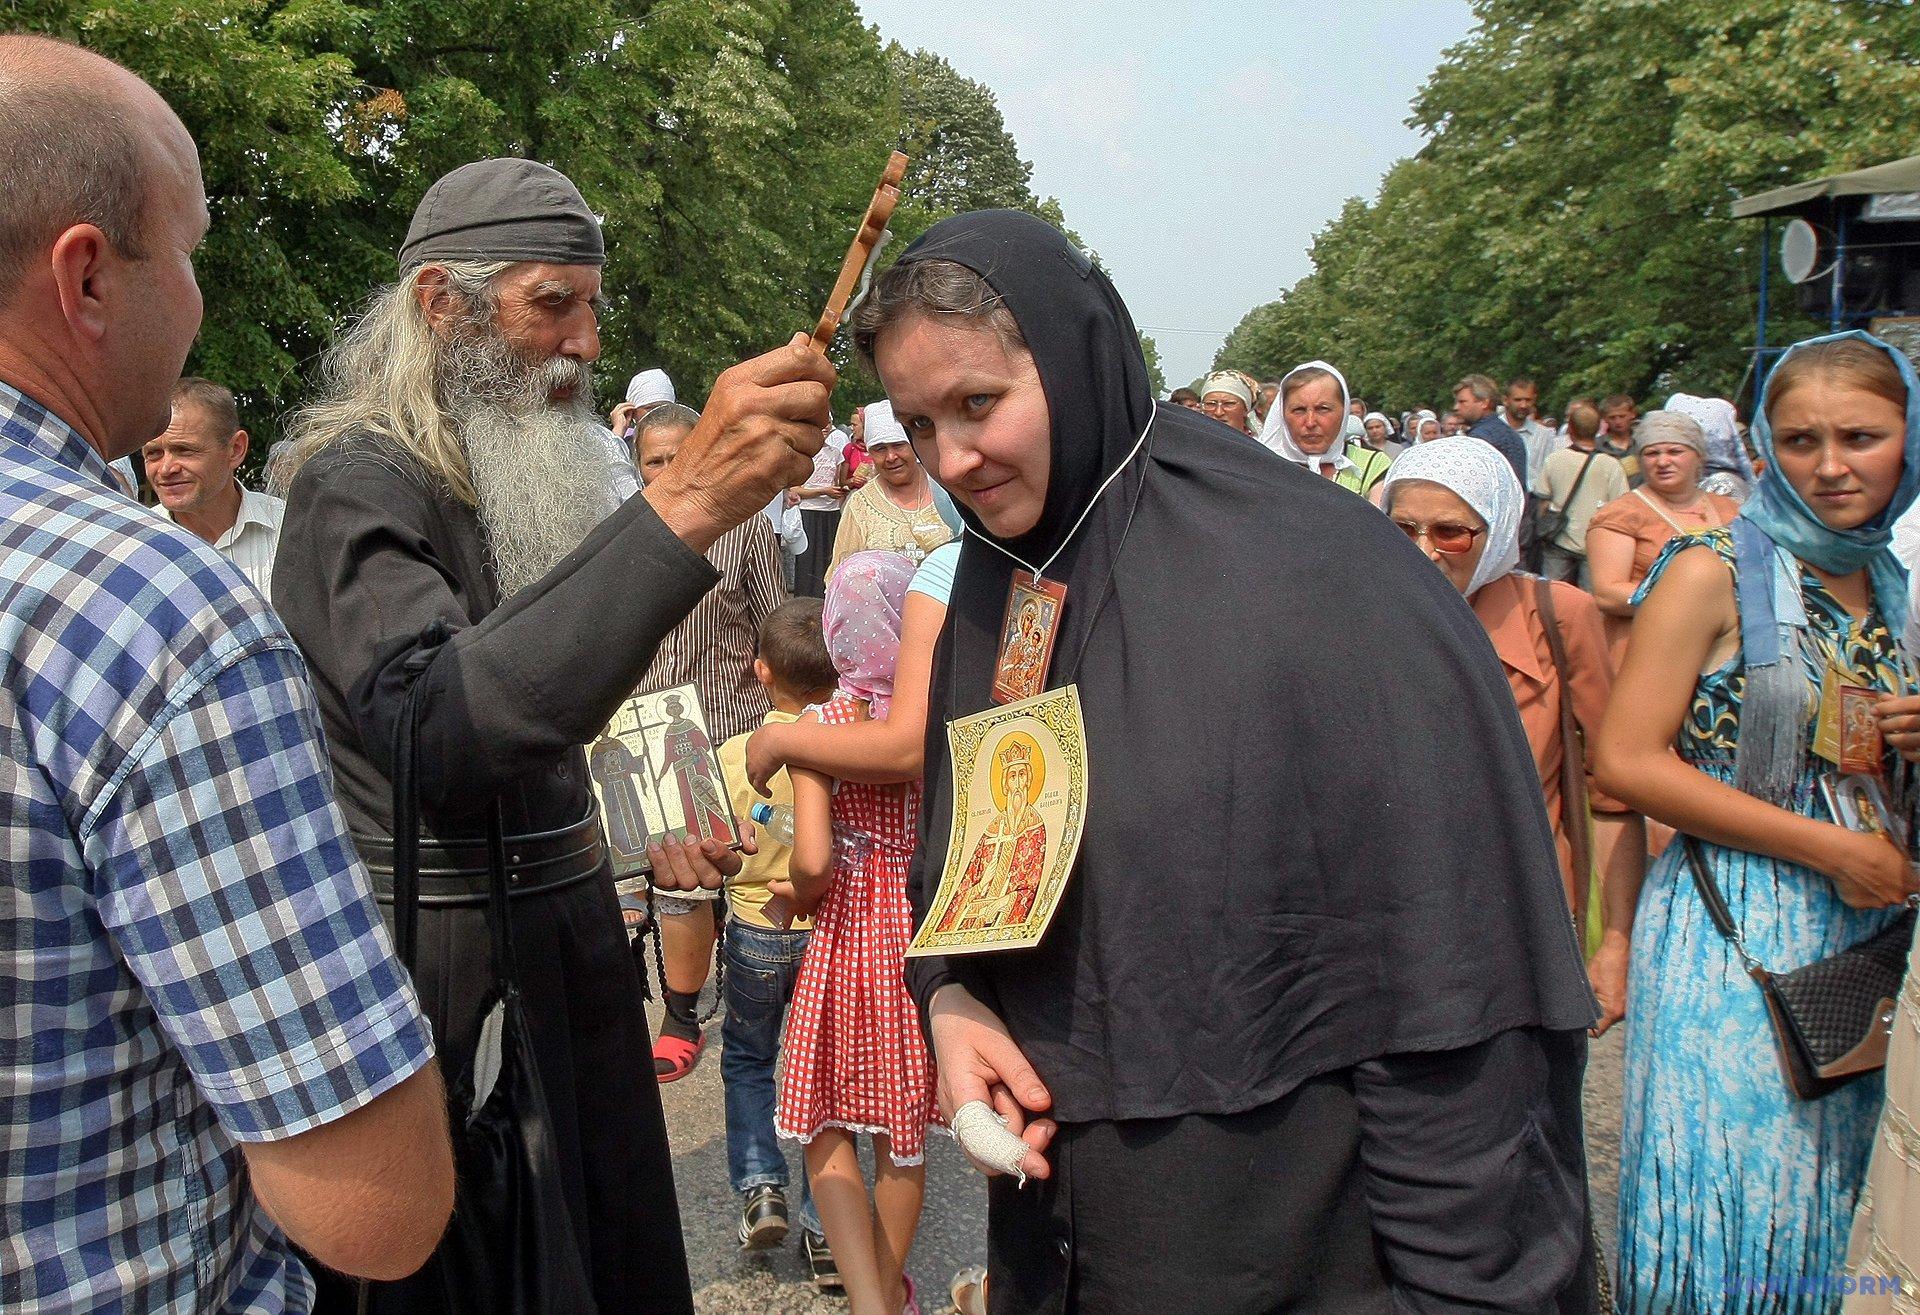 Участники крестного хода УПЦ МП / Фото: Владимир Тарасов, Укринформ